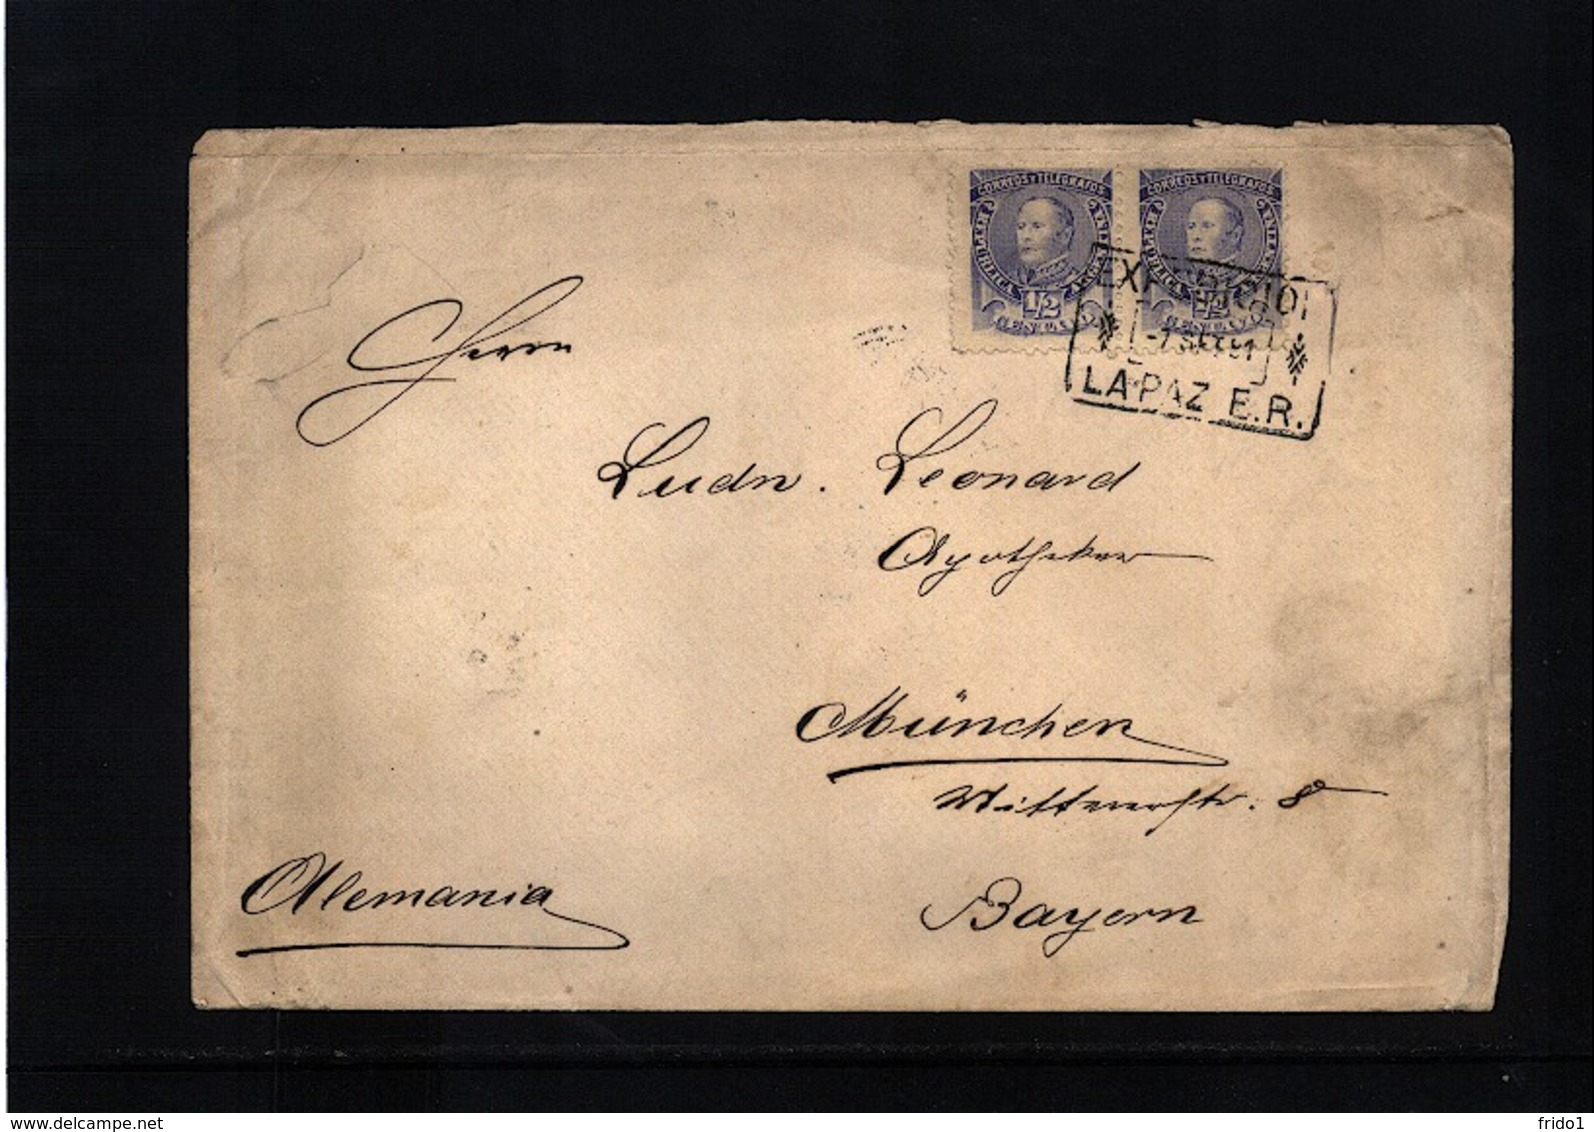 Argentina Interesting Letter - Lettres & Documents